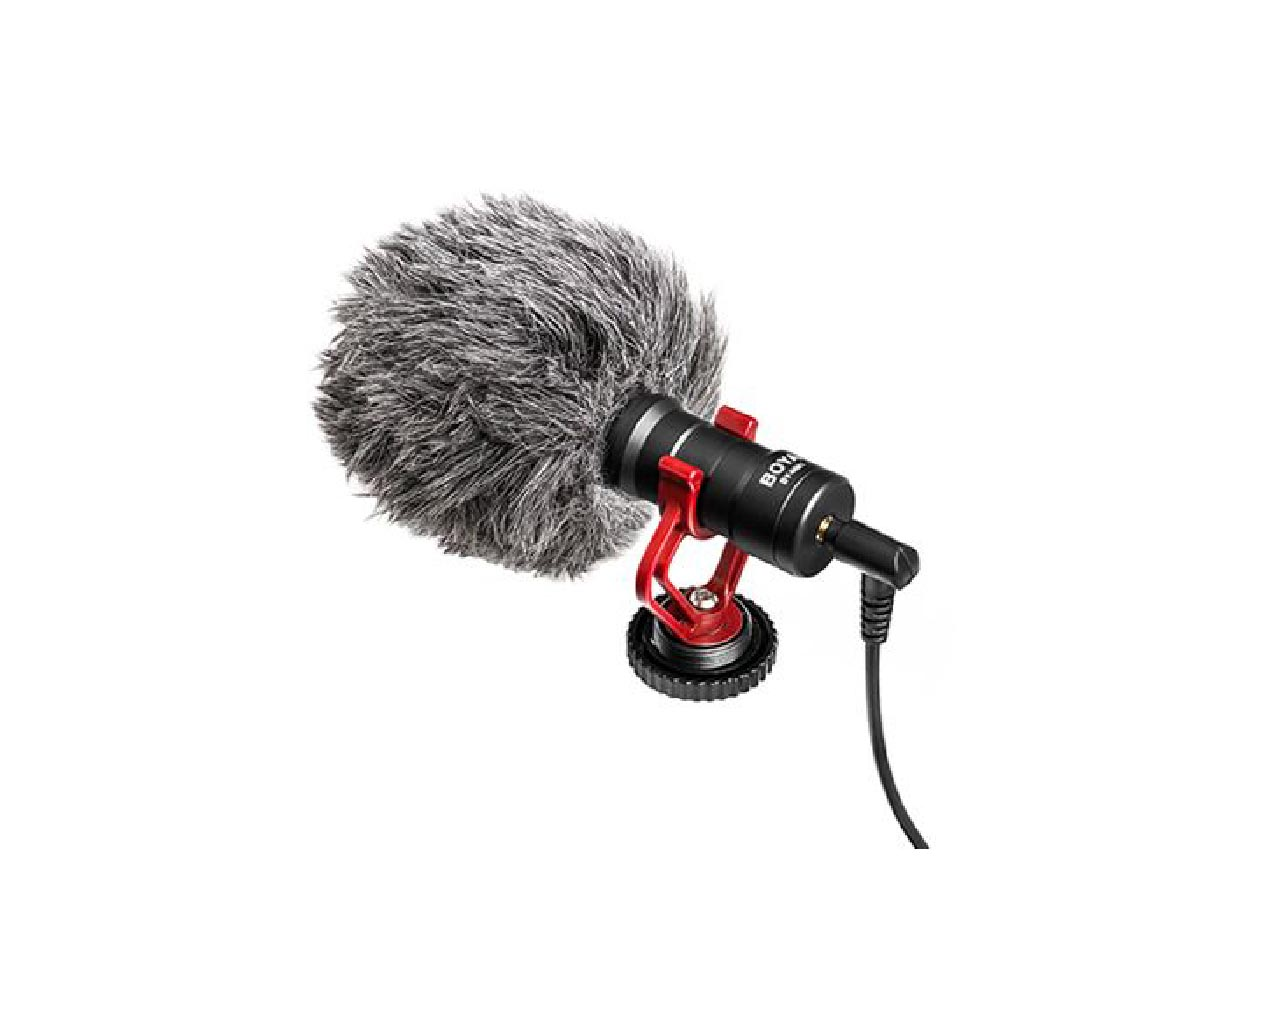 Profoto audio | Master Class Photographers